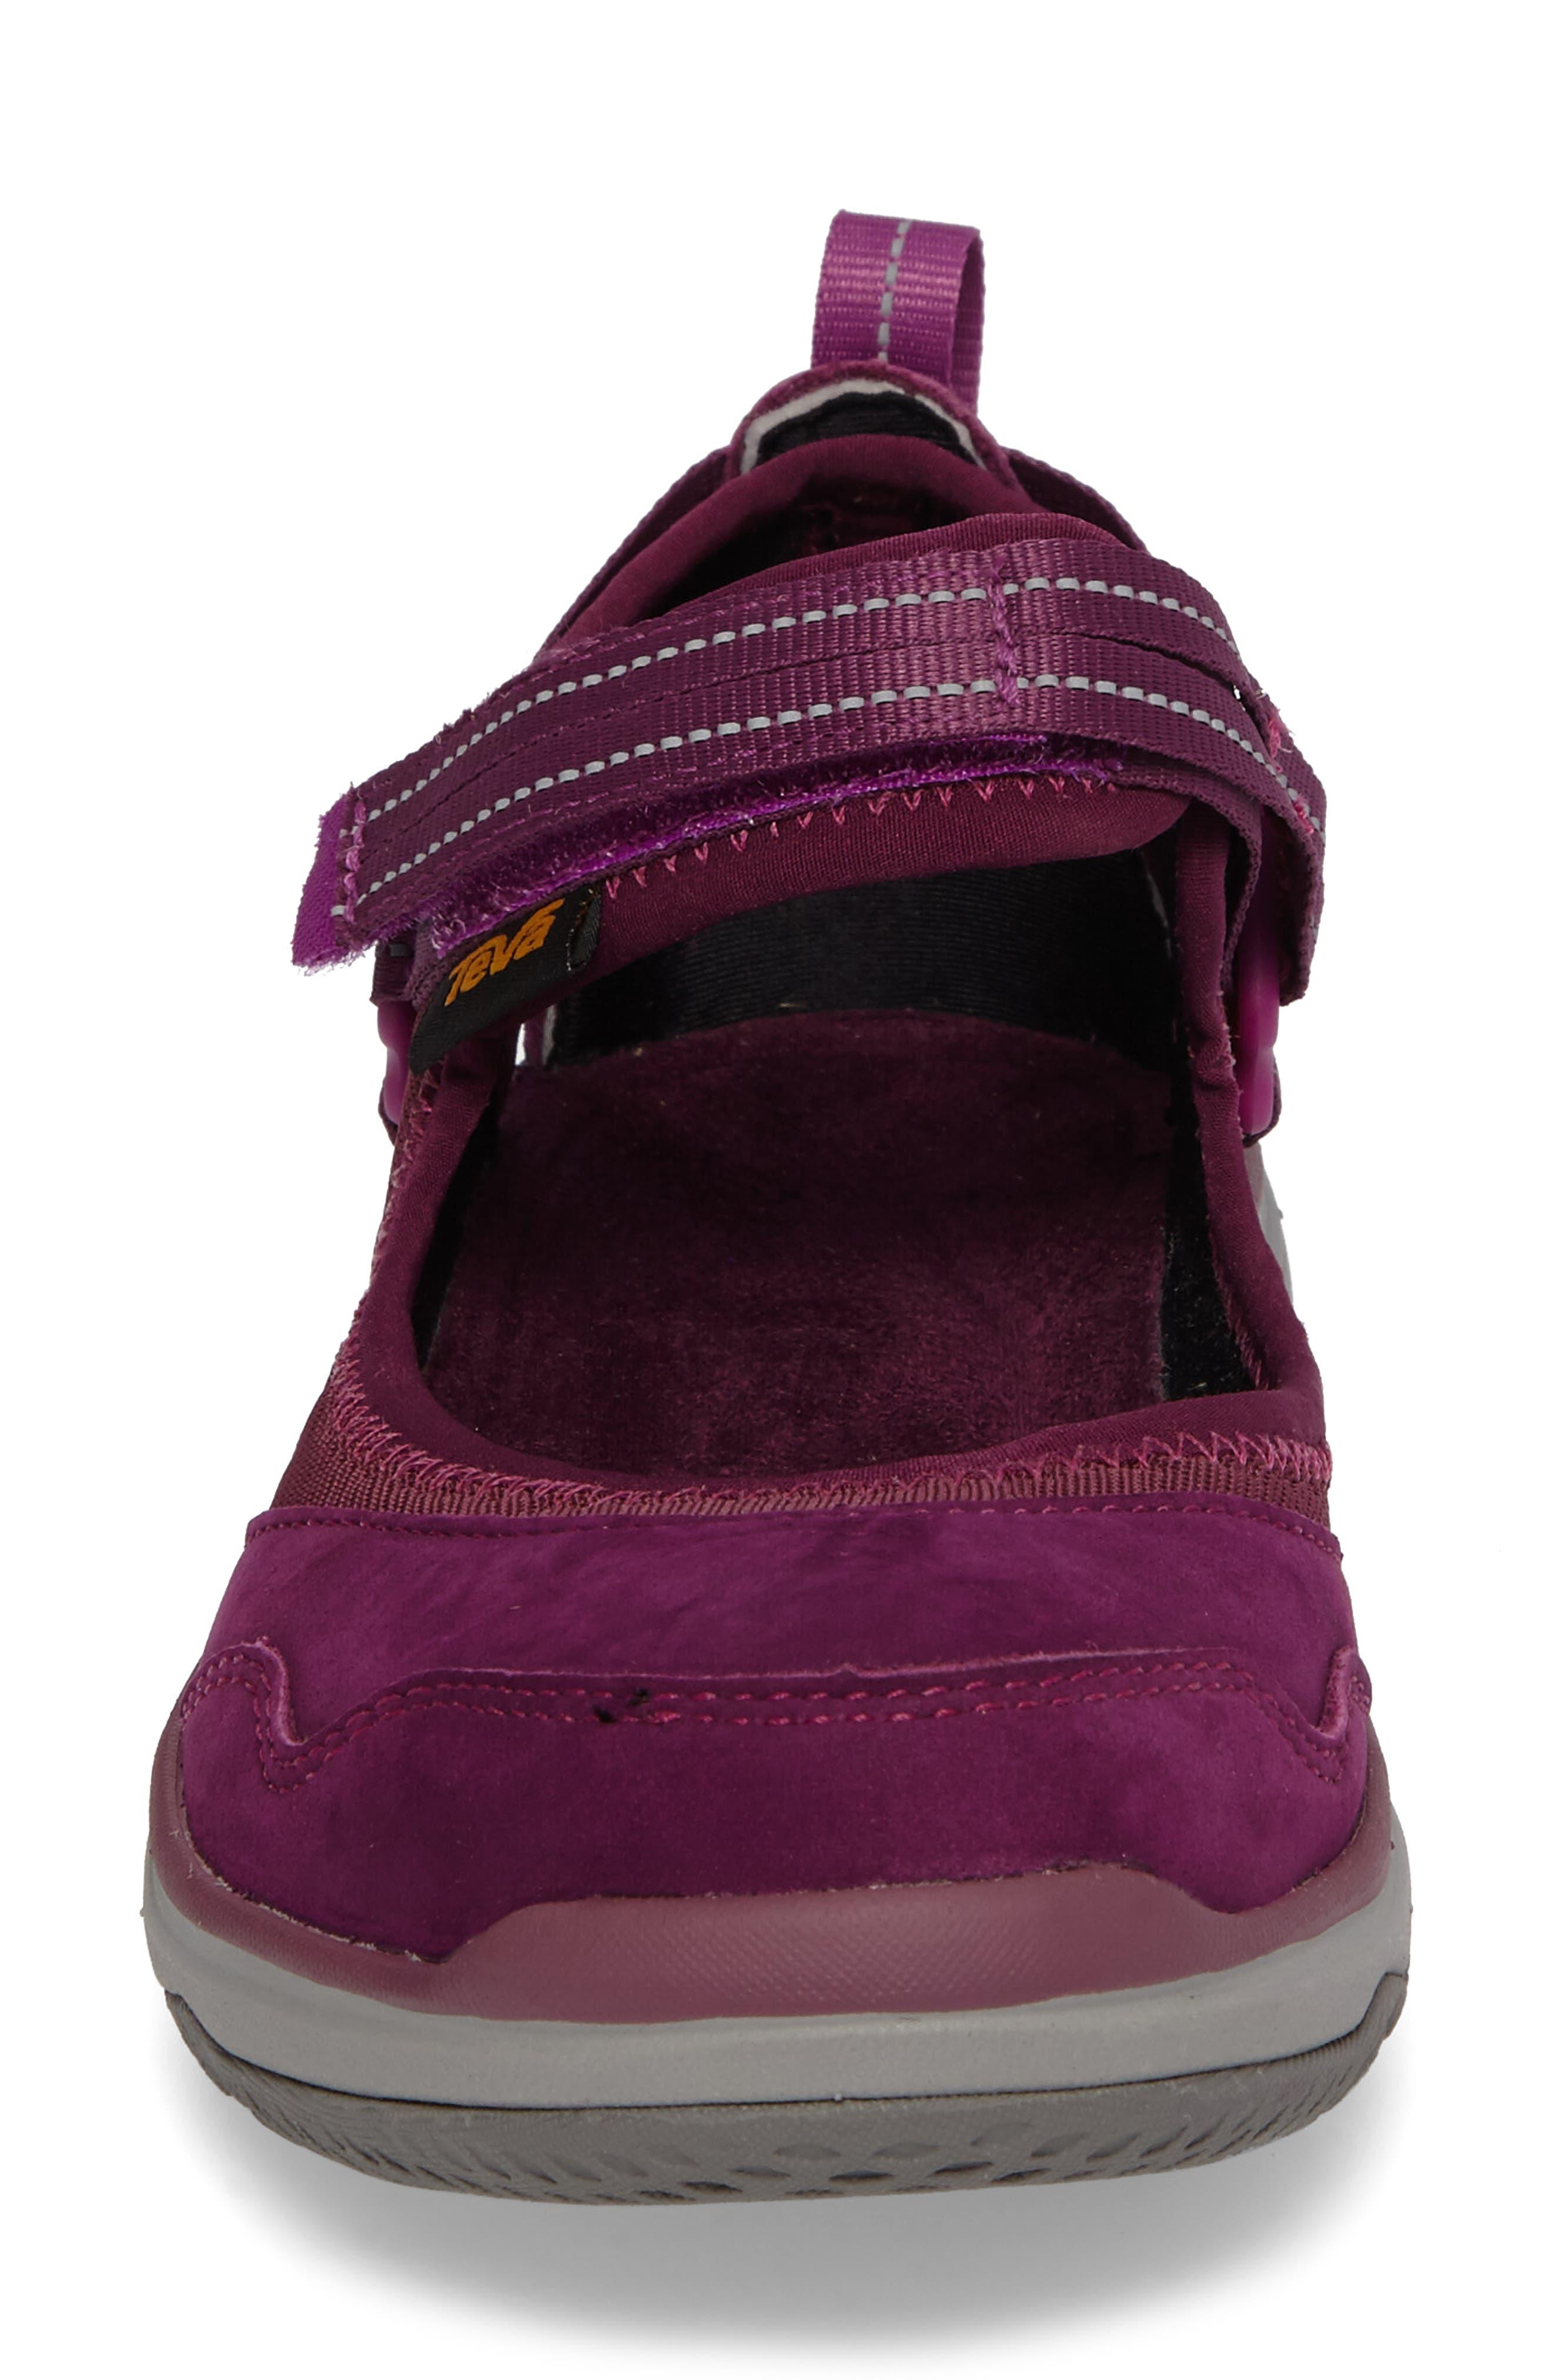 Terra Float Travel Mary Jane Flat,                             Alternate thumbnail 4, color,                             Dark Purple Leather